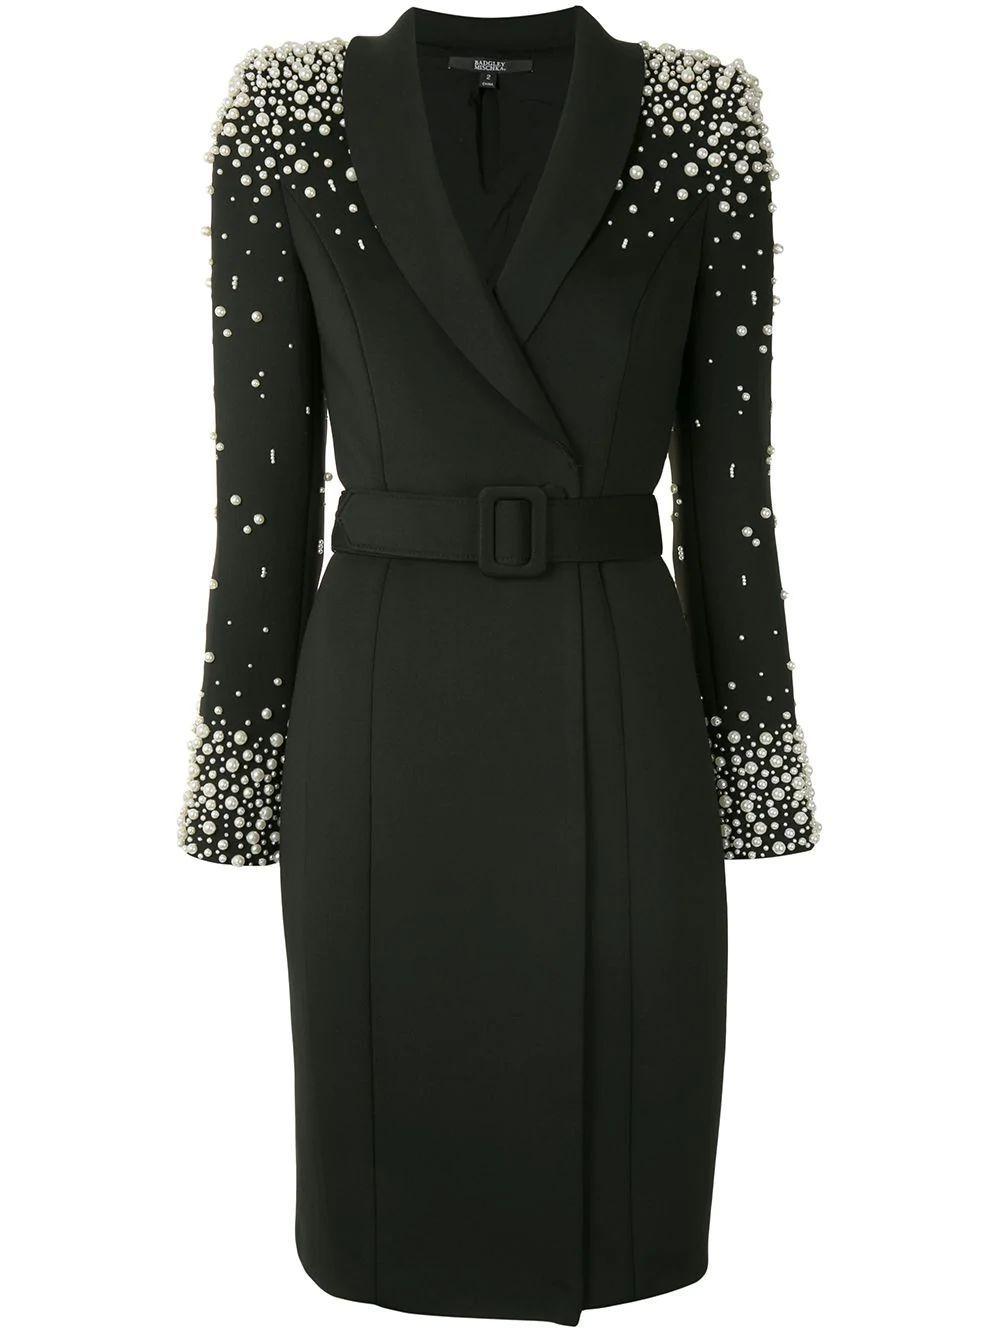 Pearl Embellished Blazer Dress Item # SC2541-F20